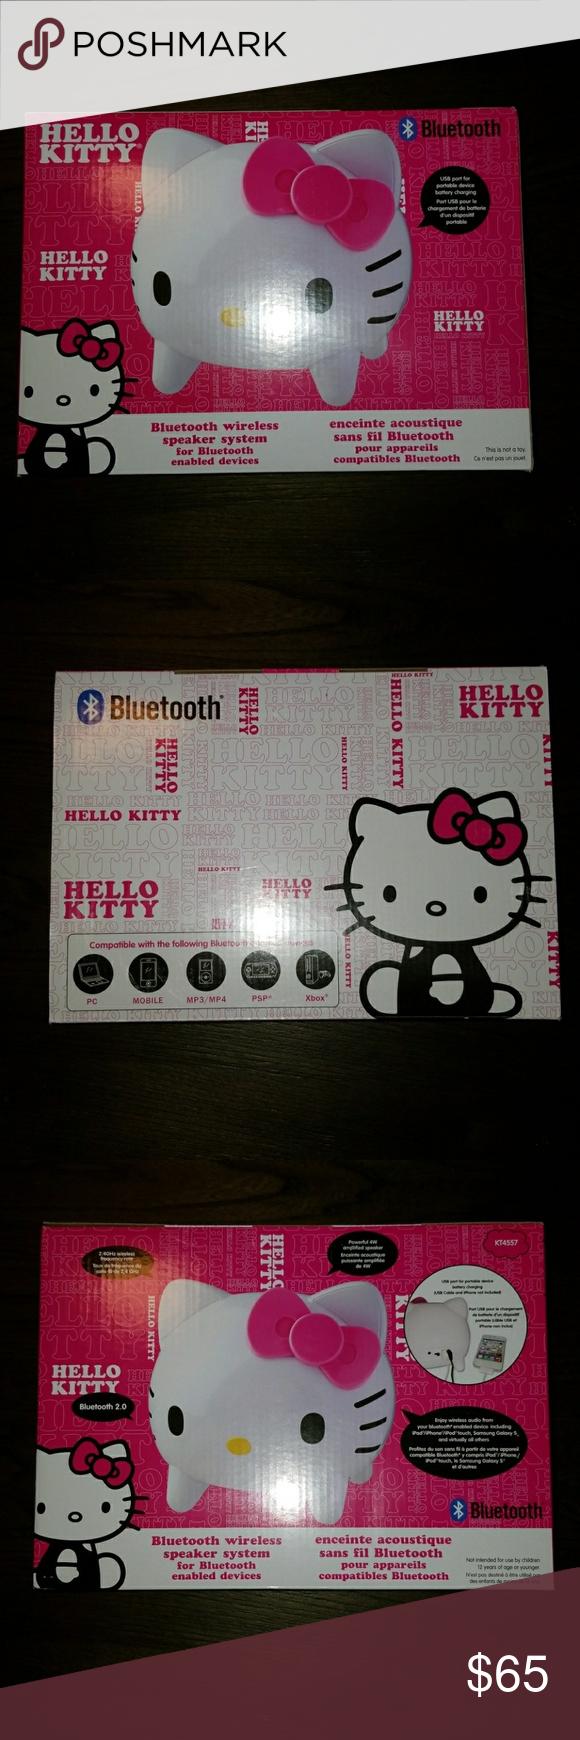 New Hello Kitty Bluetooth Wireless Speaker System Measures